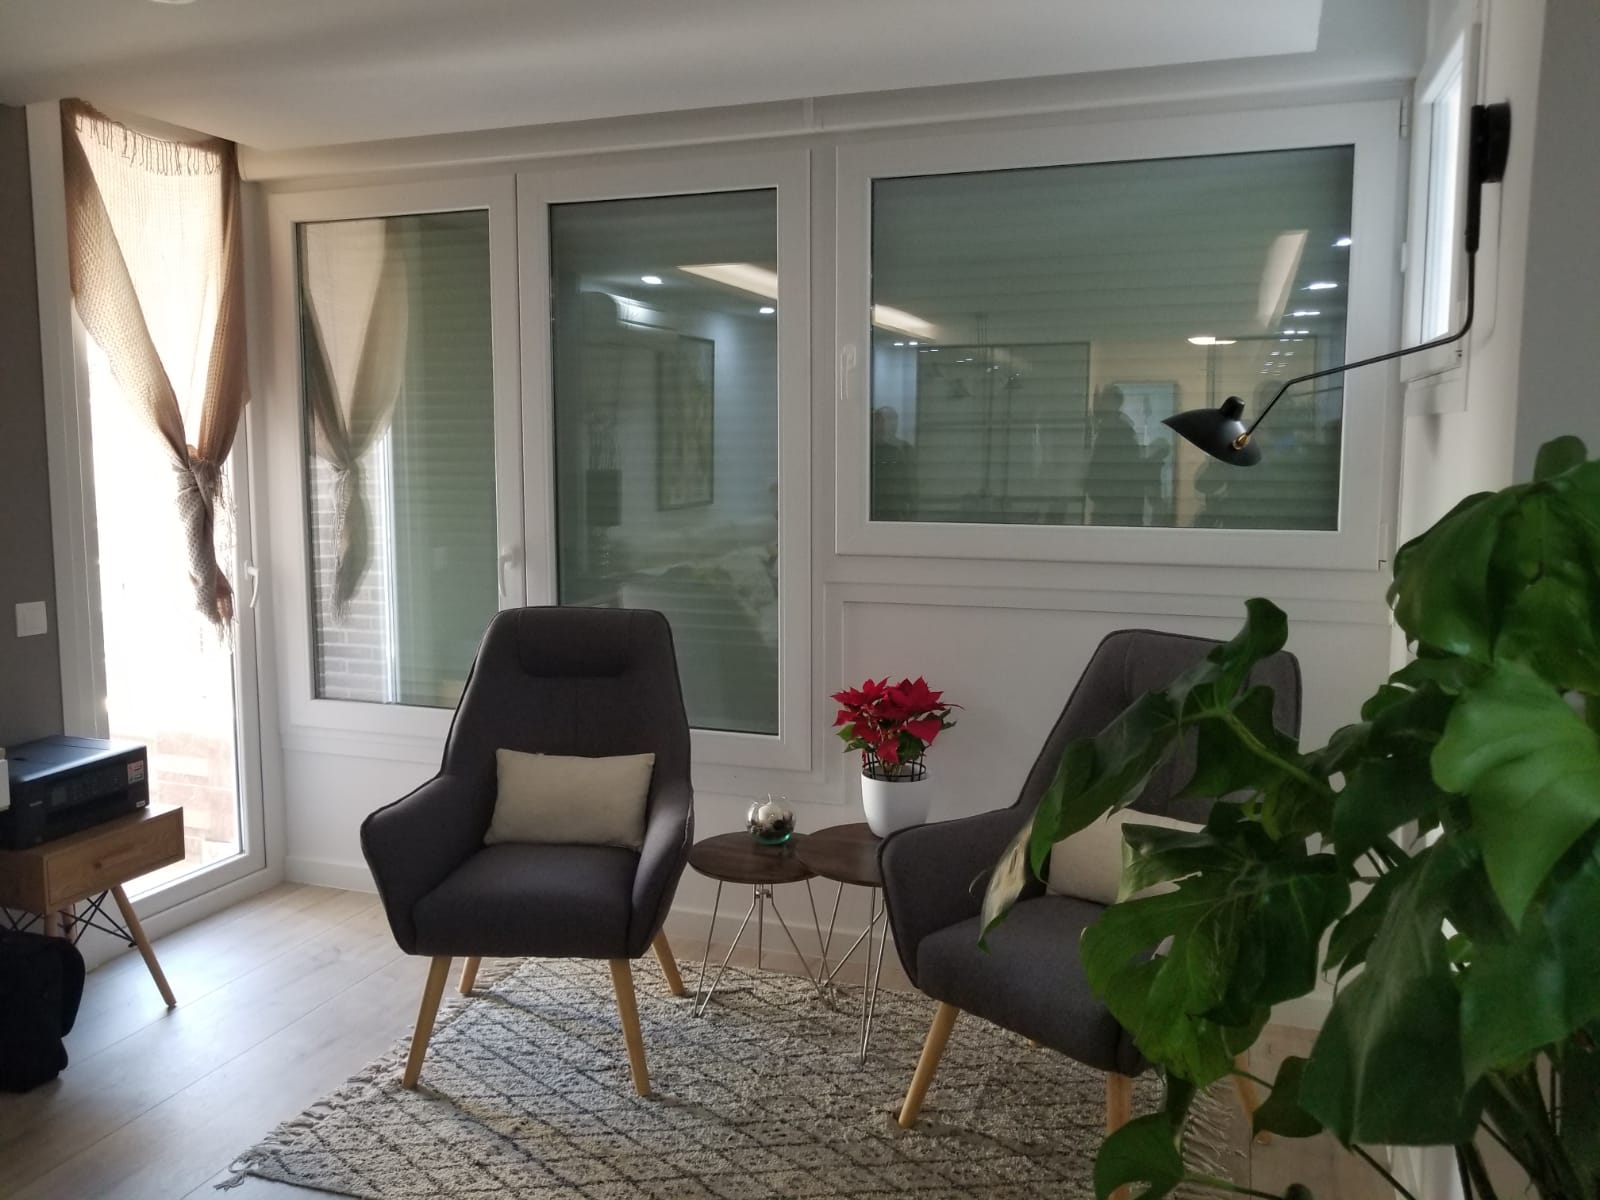 Rehabilitación de vivienda Málaga